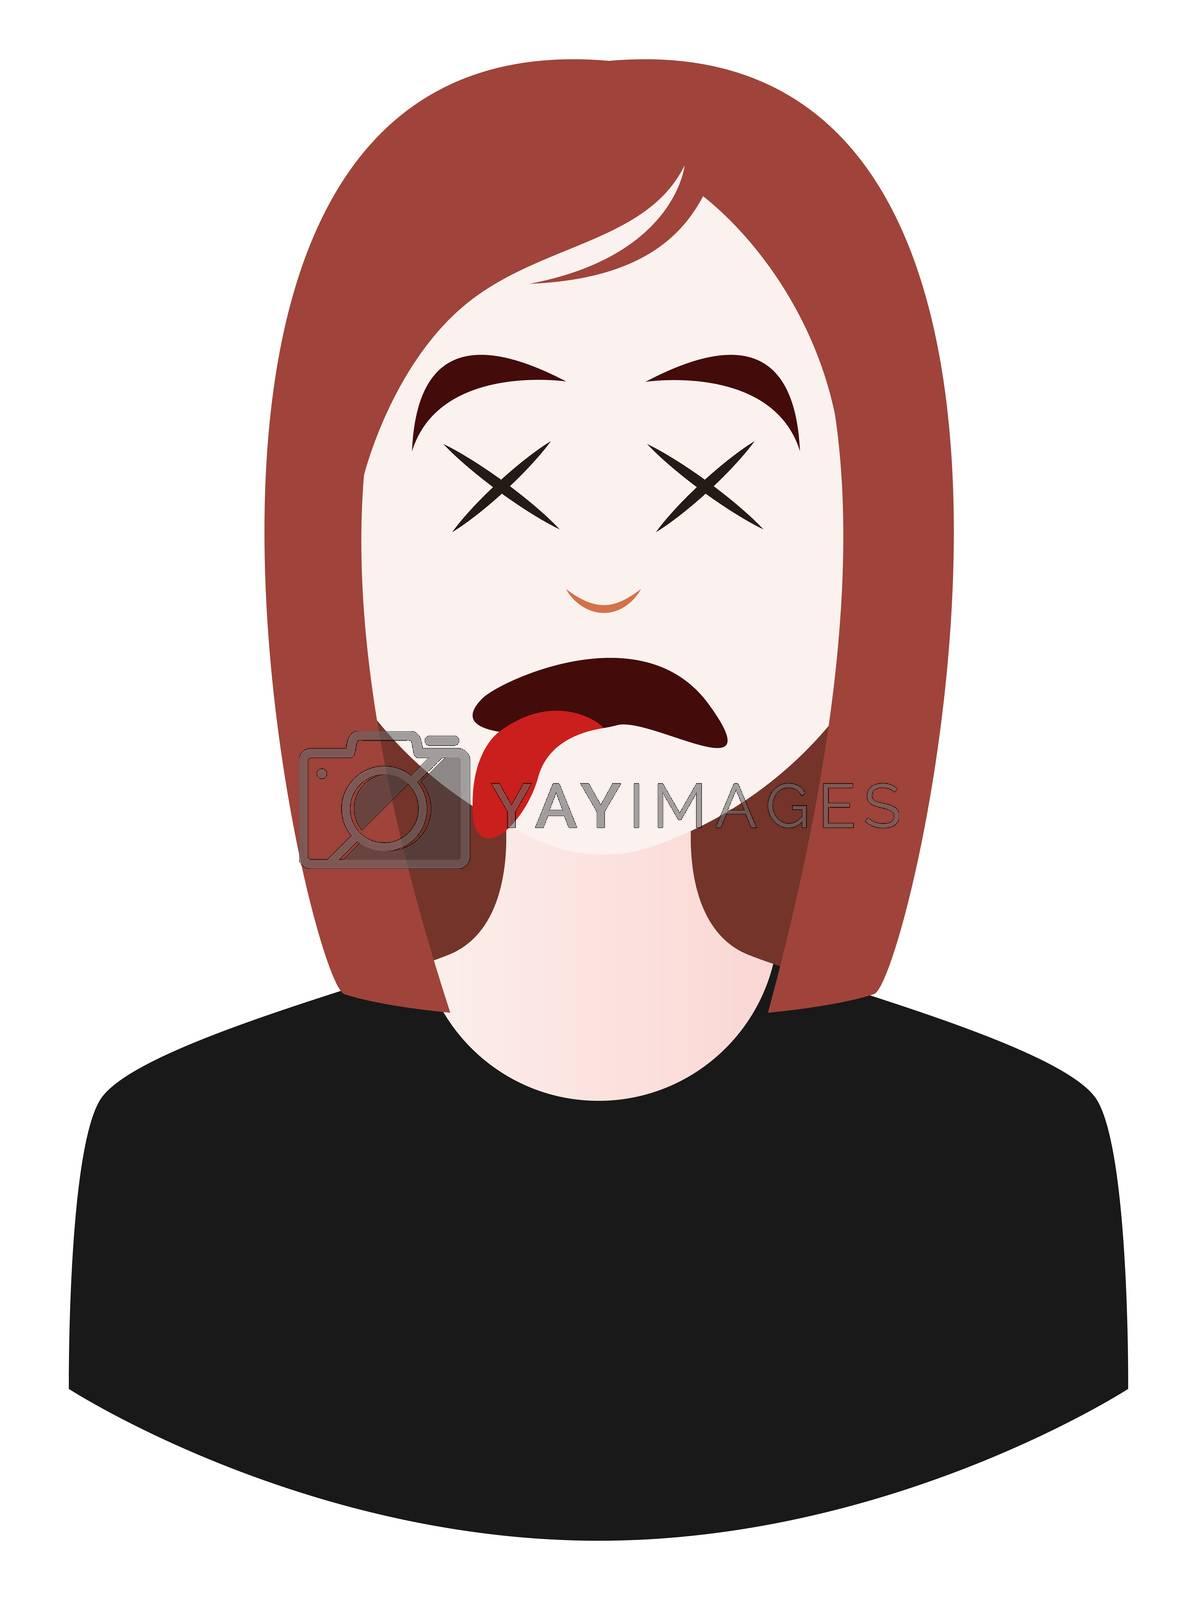 Royalty free image of Dead girl emoji, illustration, vector on white background by Morphart